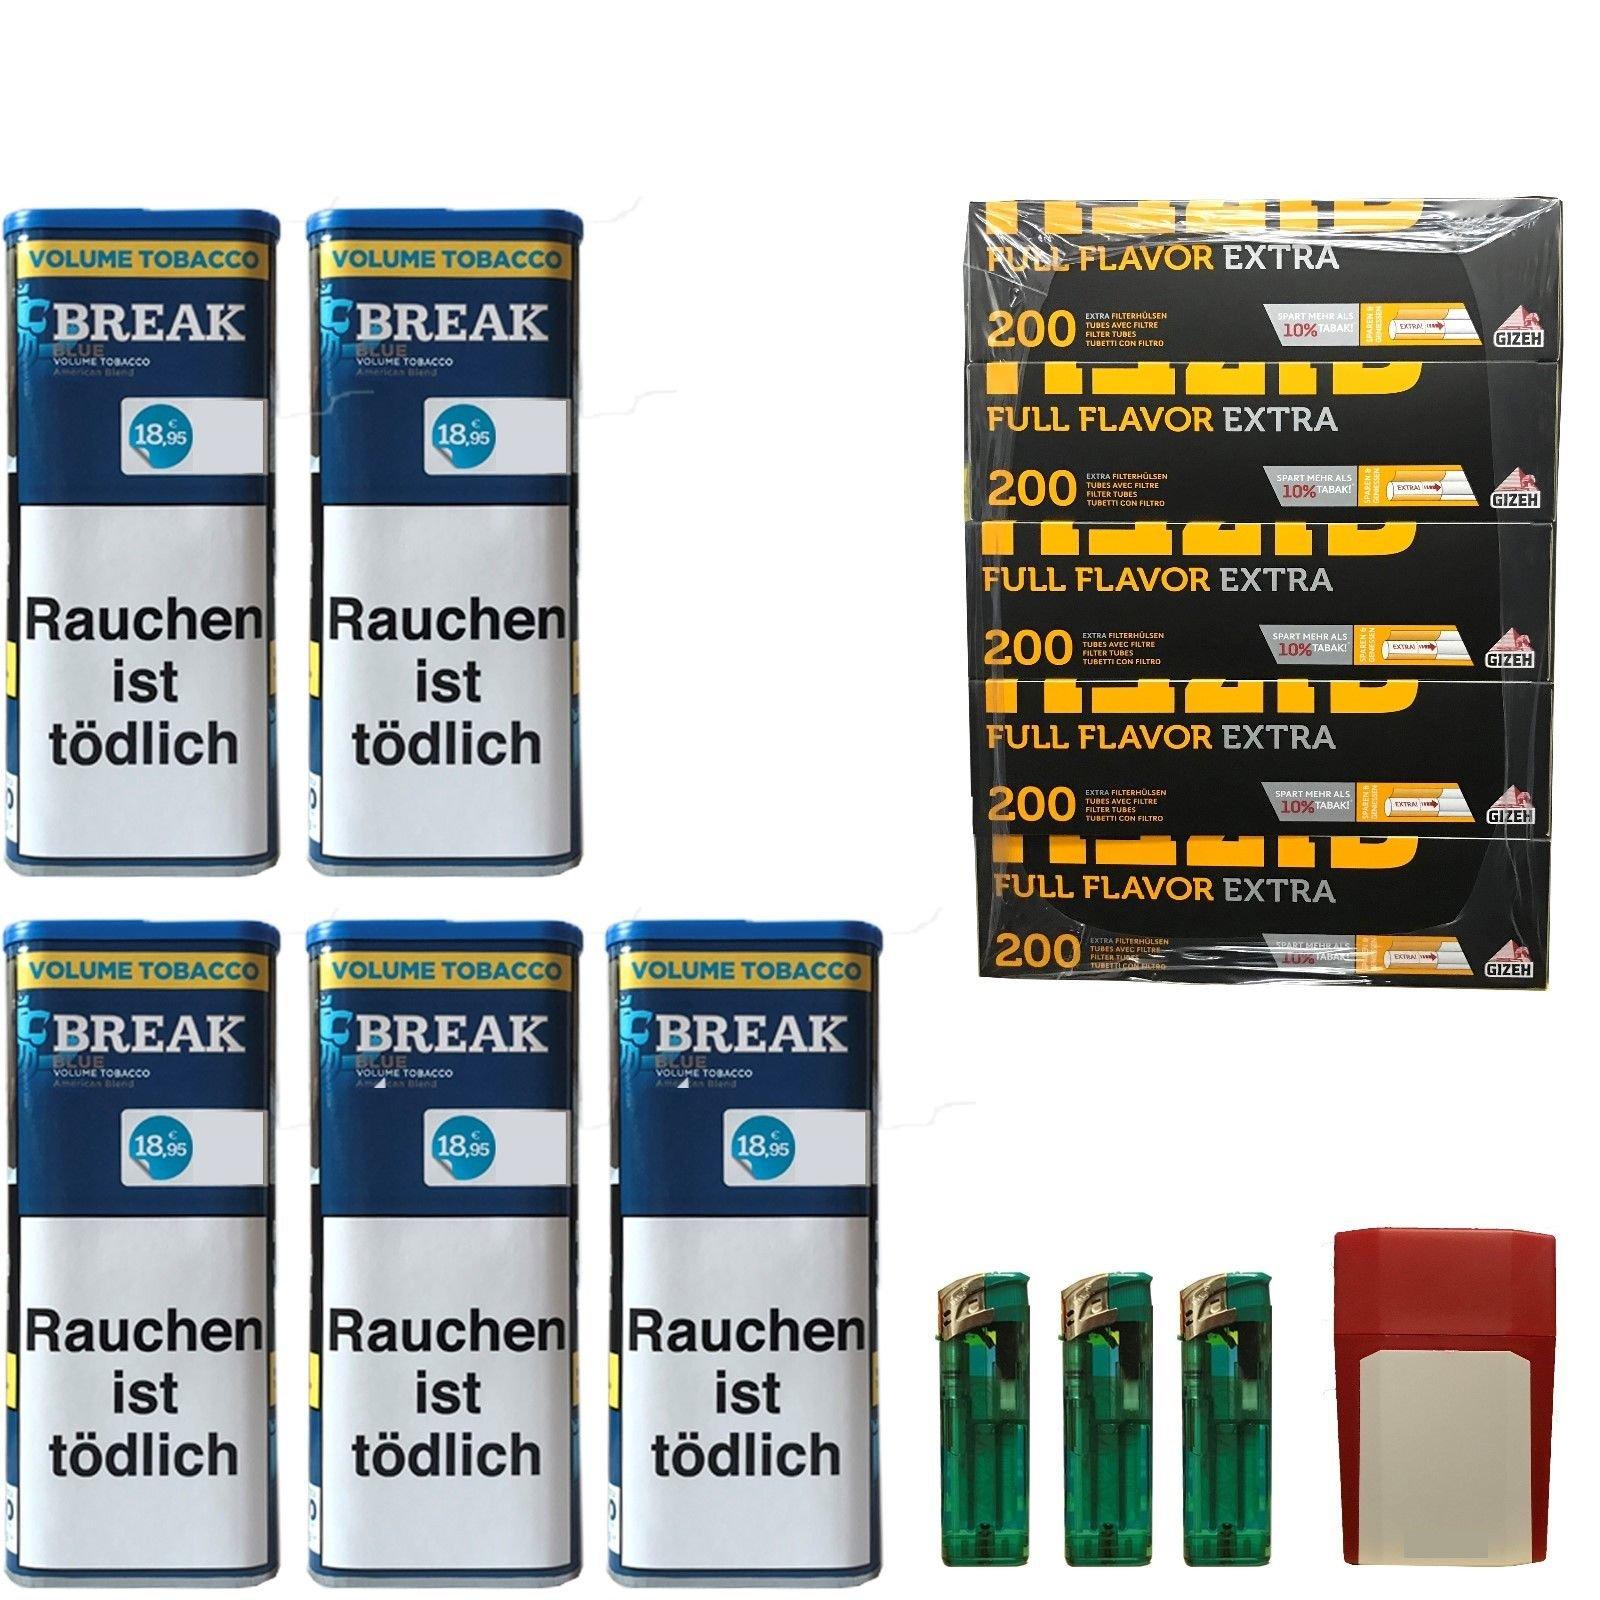 5x Break Blue/Blau XXL Volumentabak 120, Full Flavor Extra Hülsen, Feuerz., Box